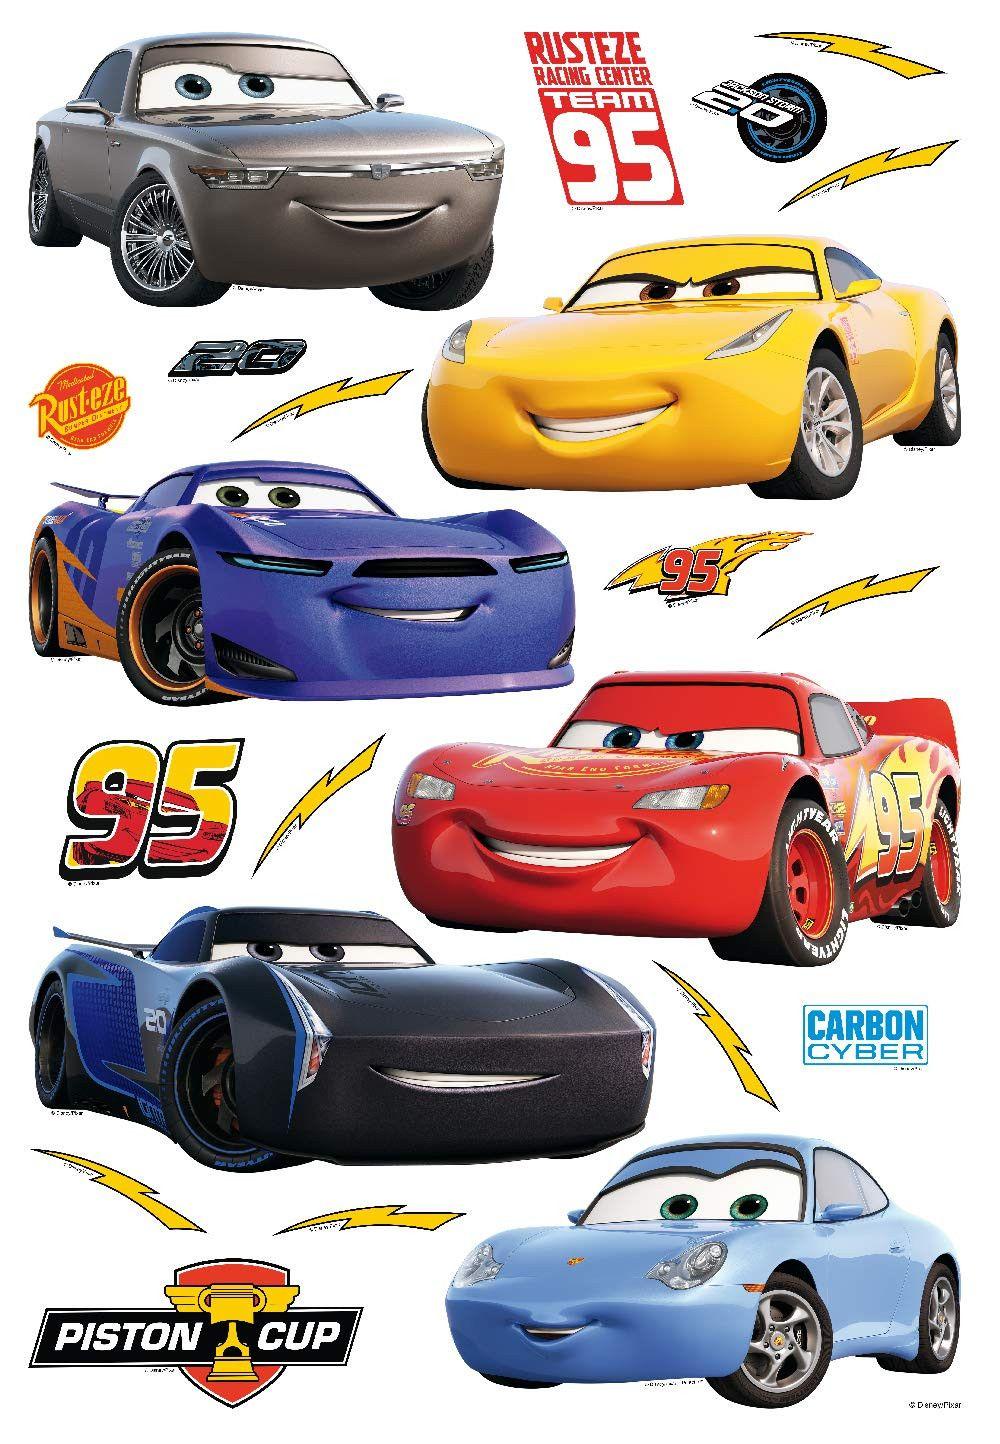 Stickers Geant Cars 3 Flash Mcqueen Sticker Sur Bebegavroche Disney Cars Party Disney Cars Movie Disney Cars [ 1444 x 1000 Pixel ]